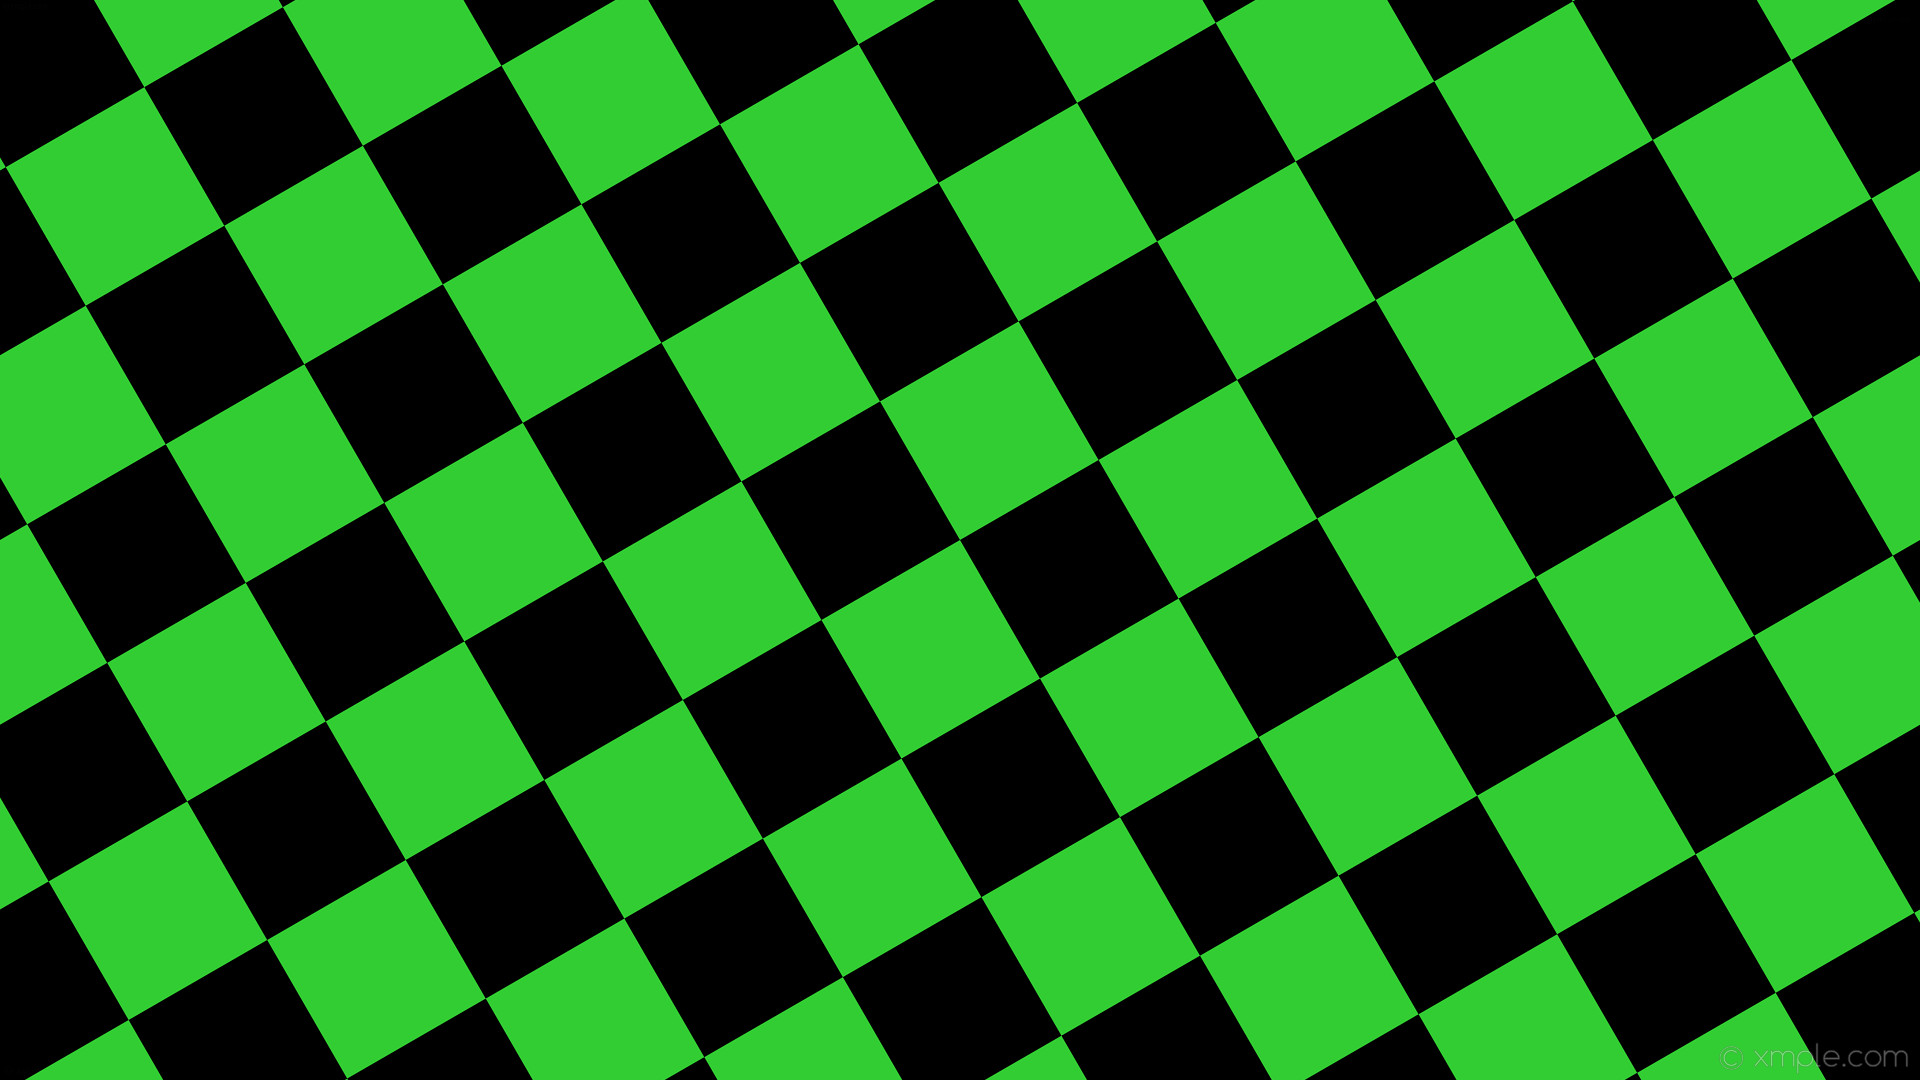 wallpaper black green checkered squares lime green #000000 #32cd32 diagonal  30° 160px